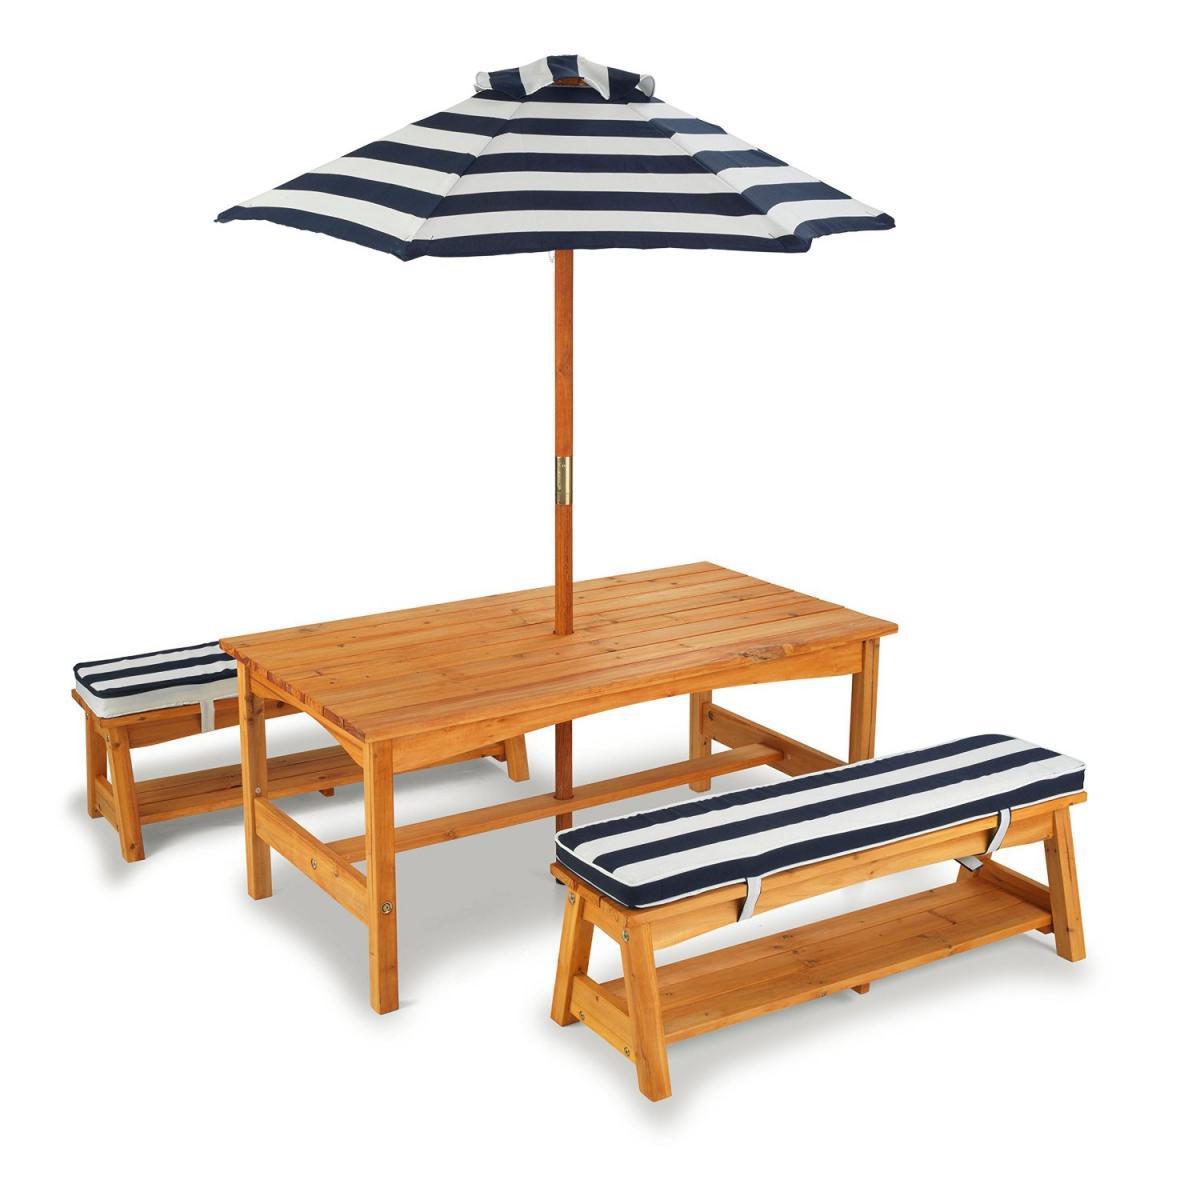 KidKraft Ensemble table et bancs de jardin avec coussins et parasol - rayé bleu marina et blanc